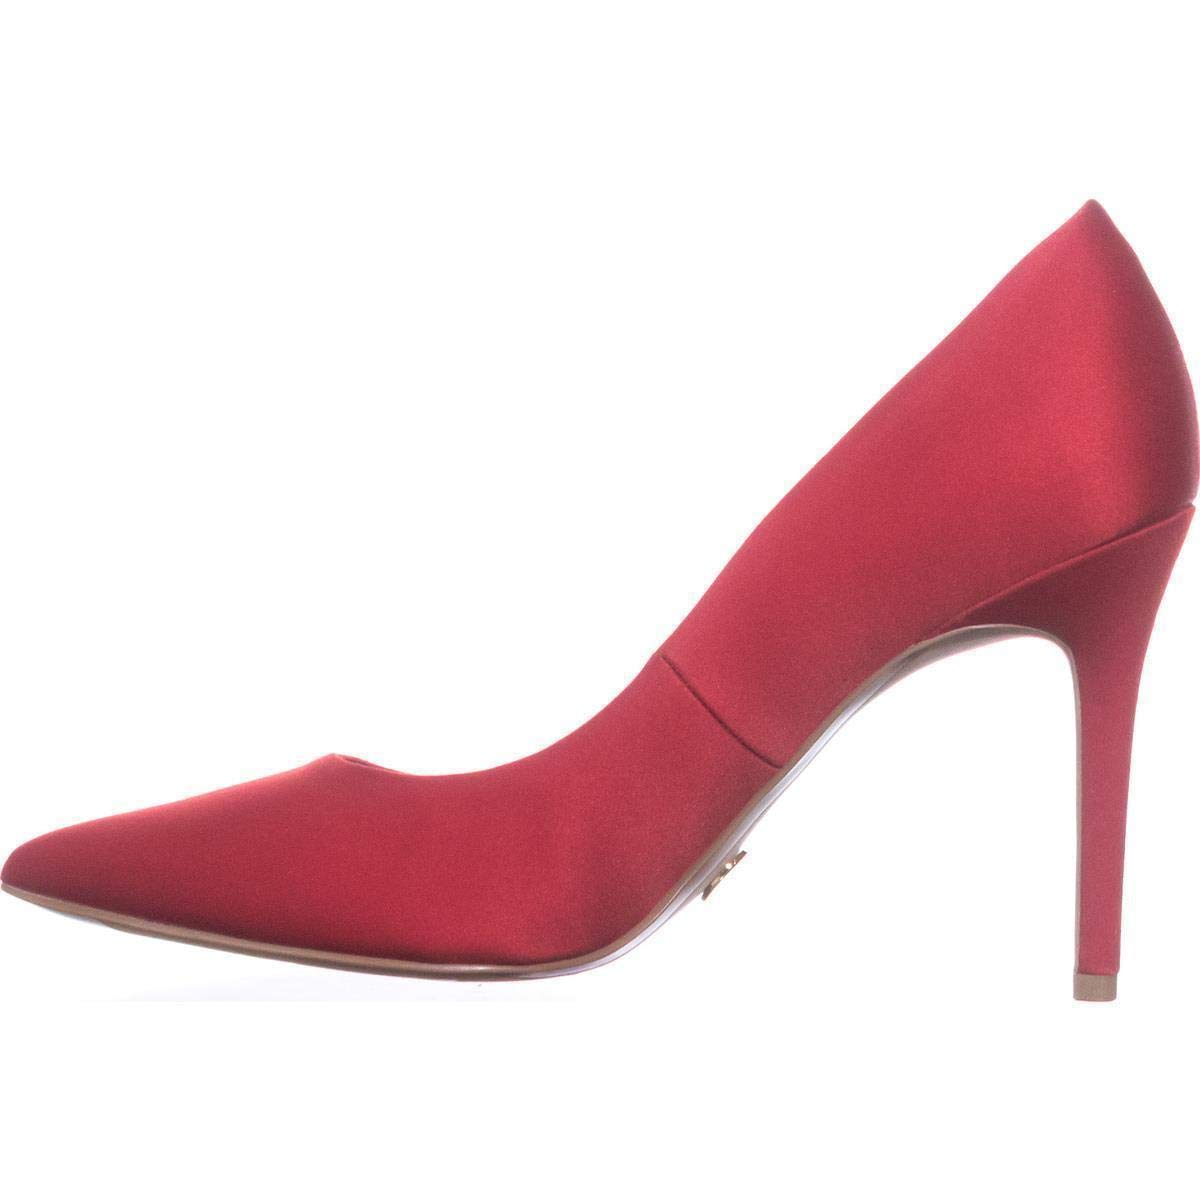 fa52fa70e8 Amazon.com | Michael Michael Kors Womens Claire Pump Pointed Toe Classic  Pumps | Shoes